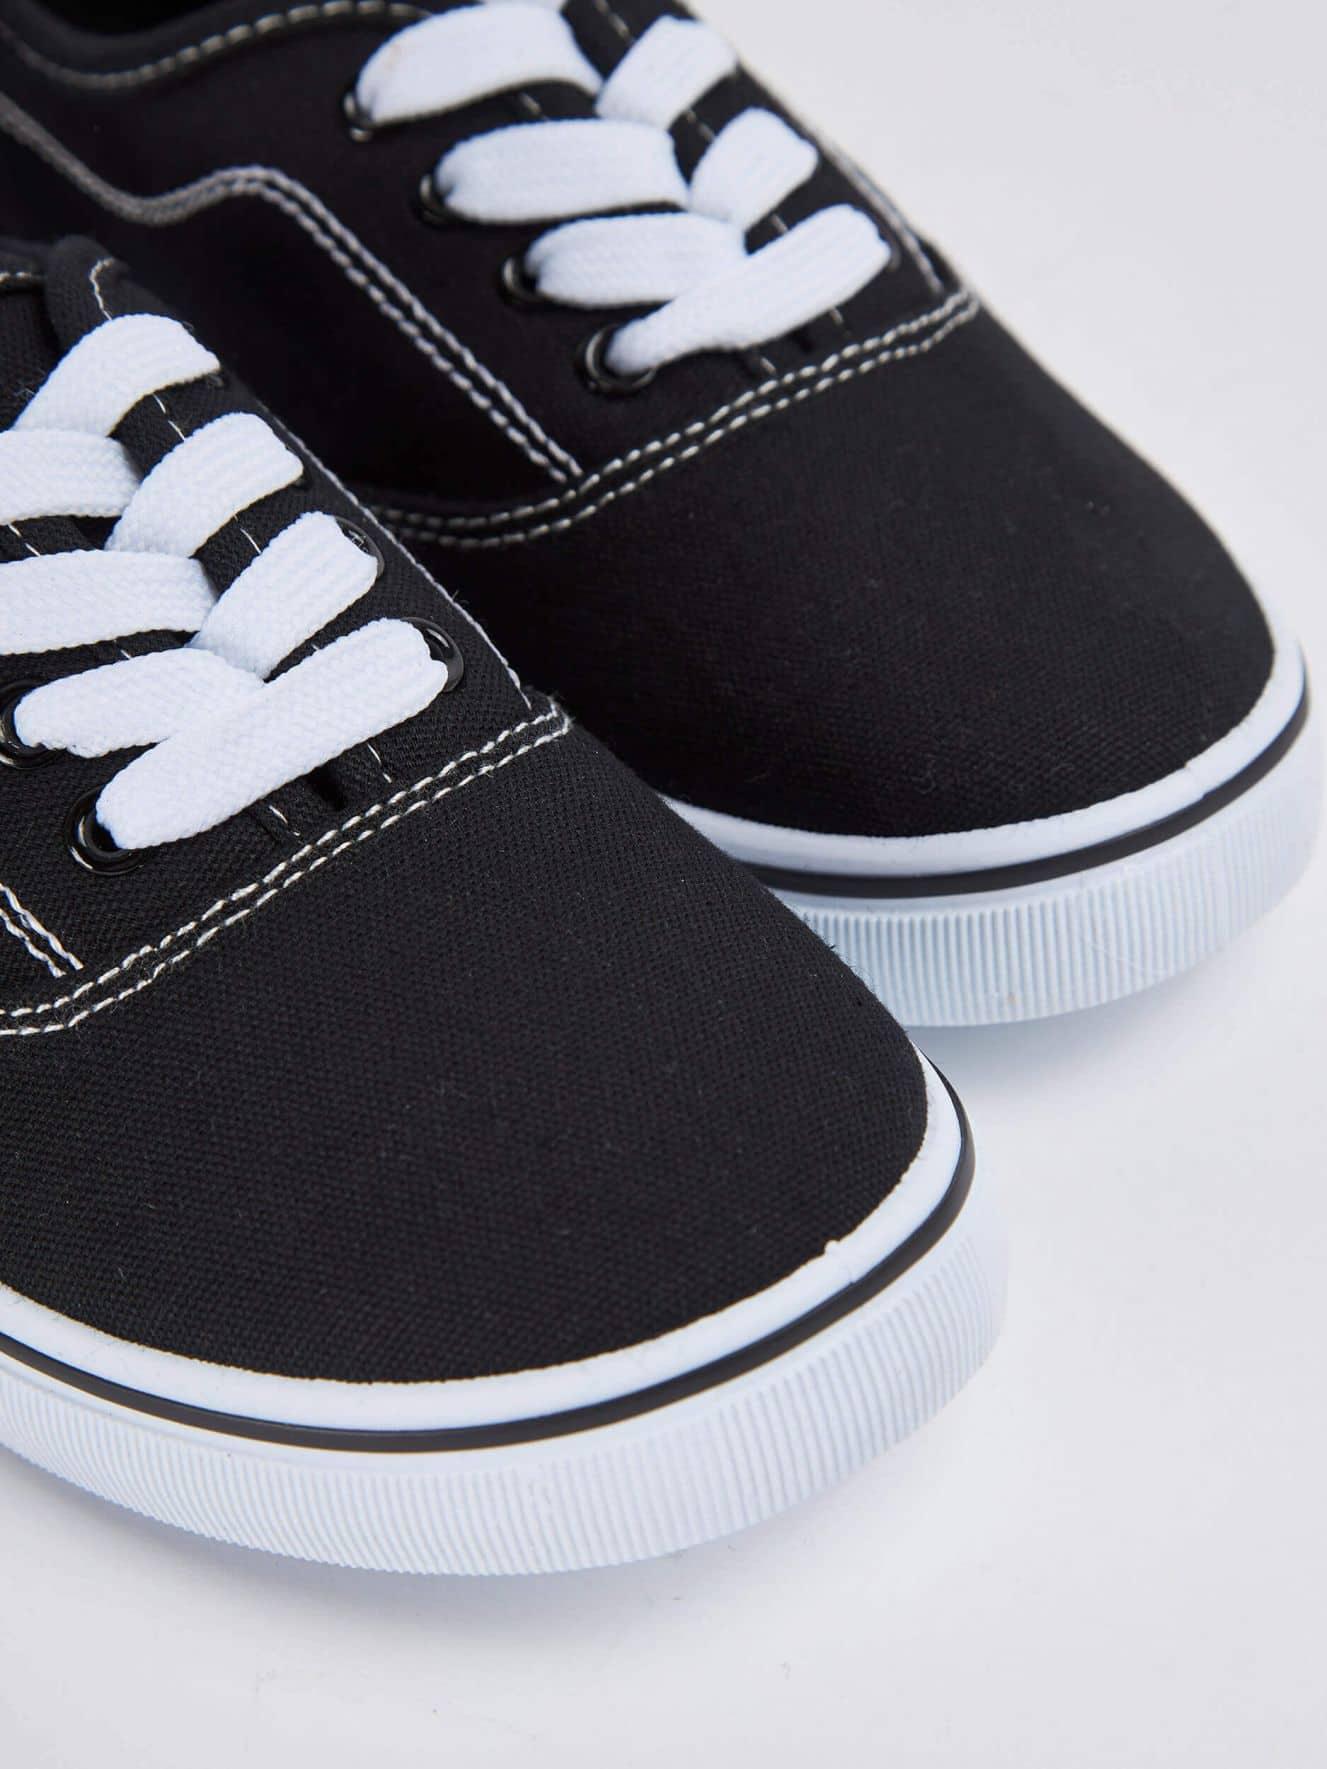 Topánky Chlapcek 010